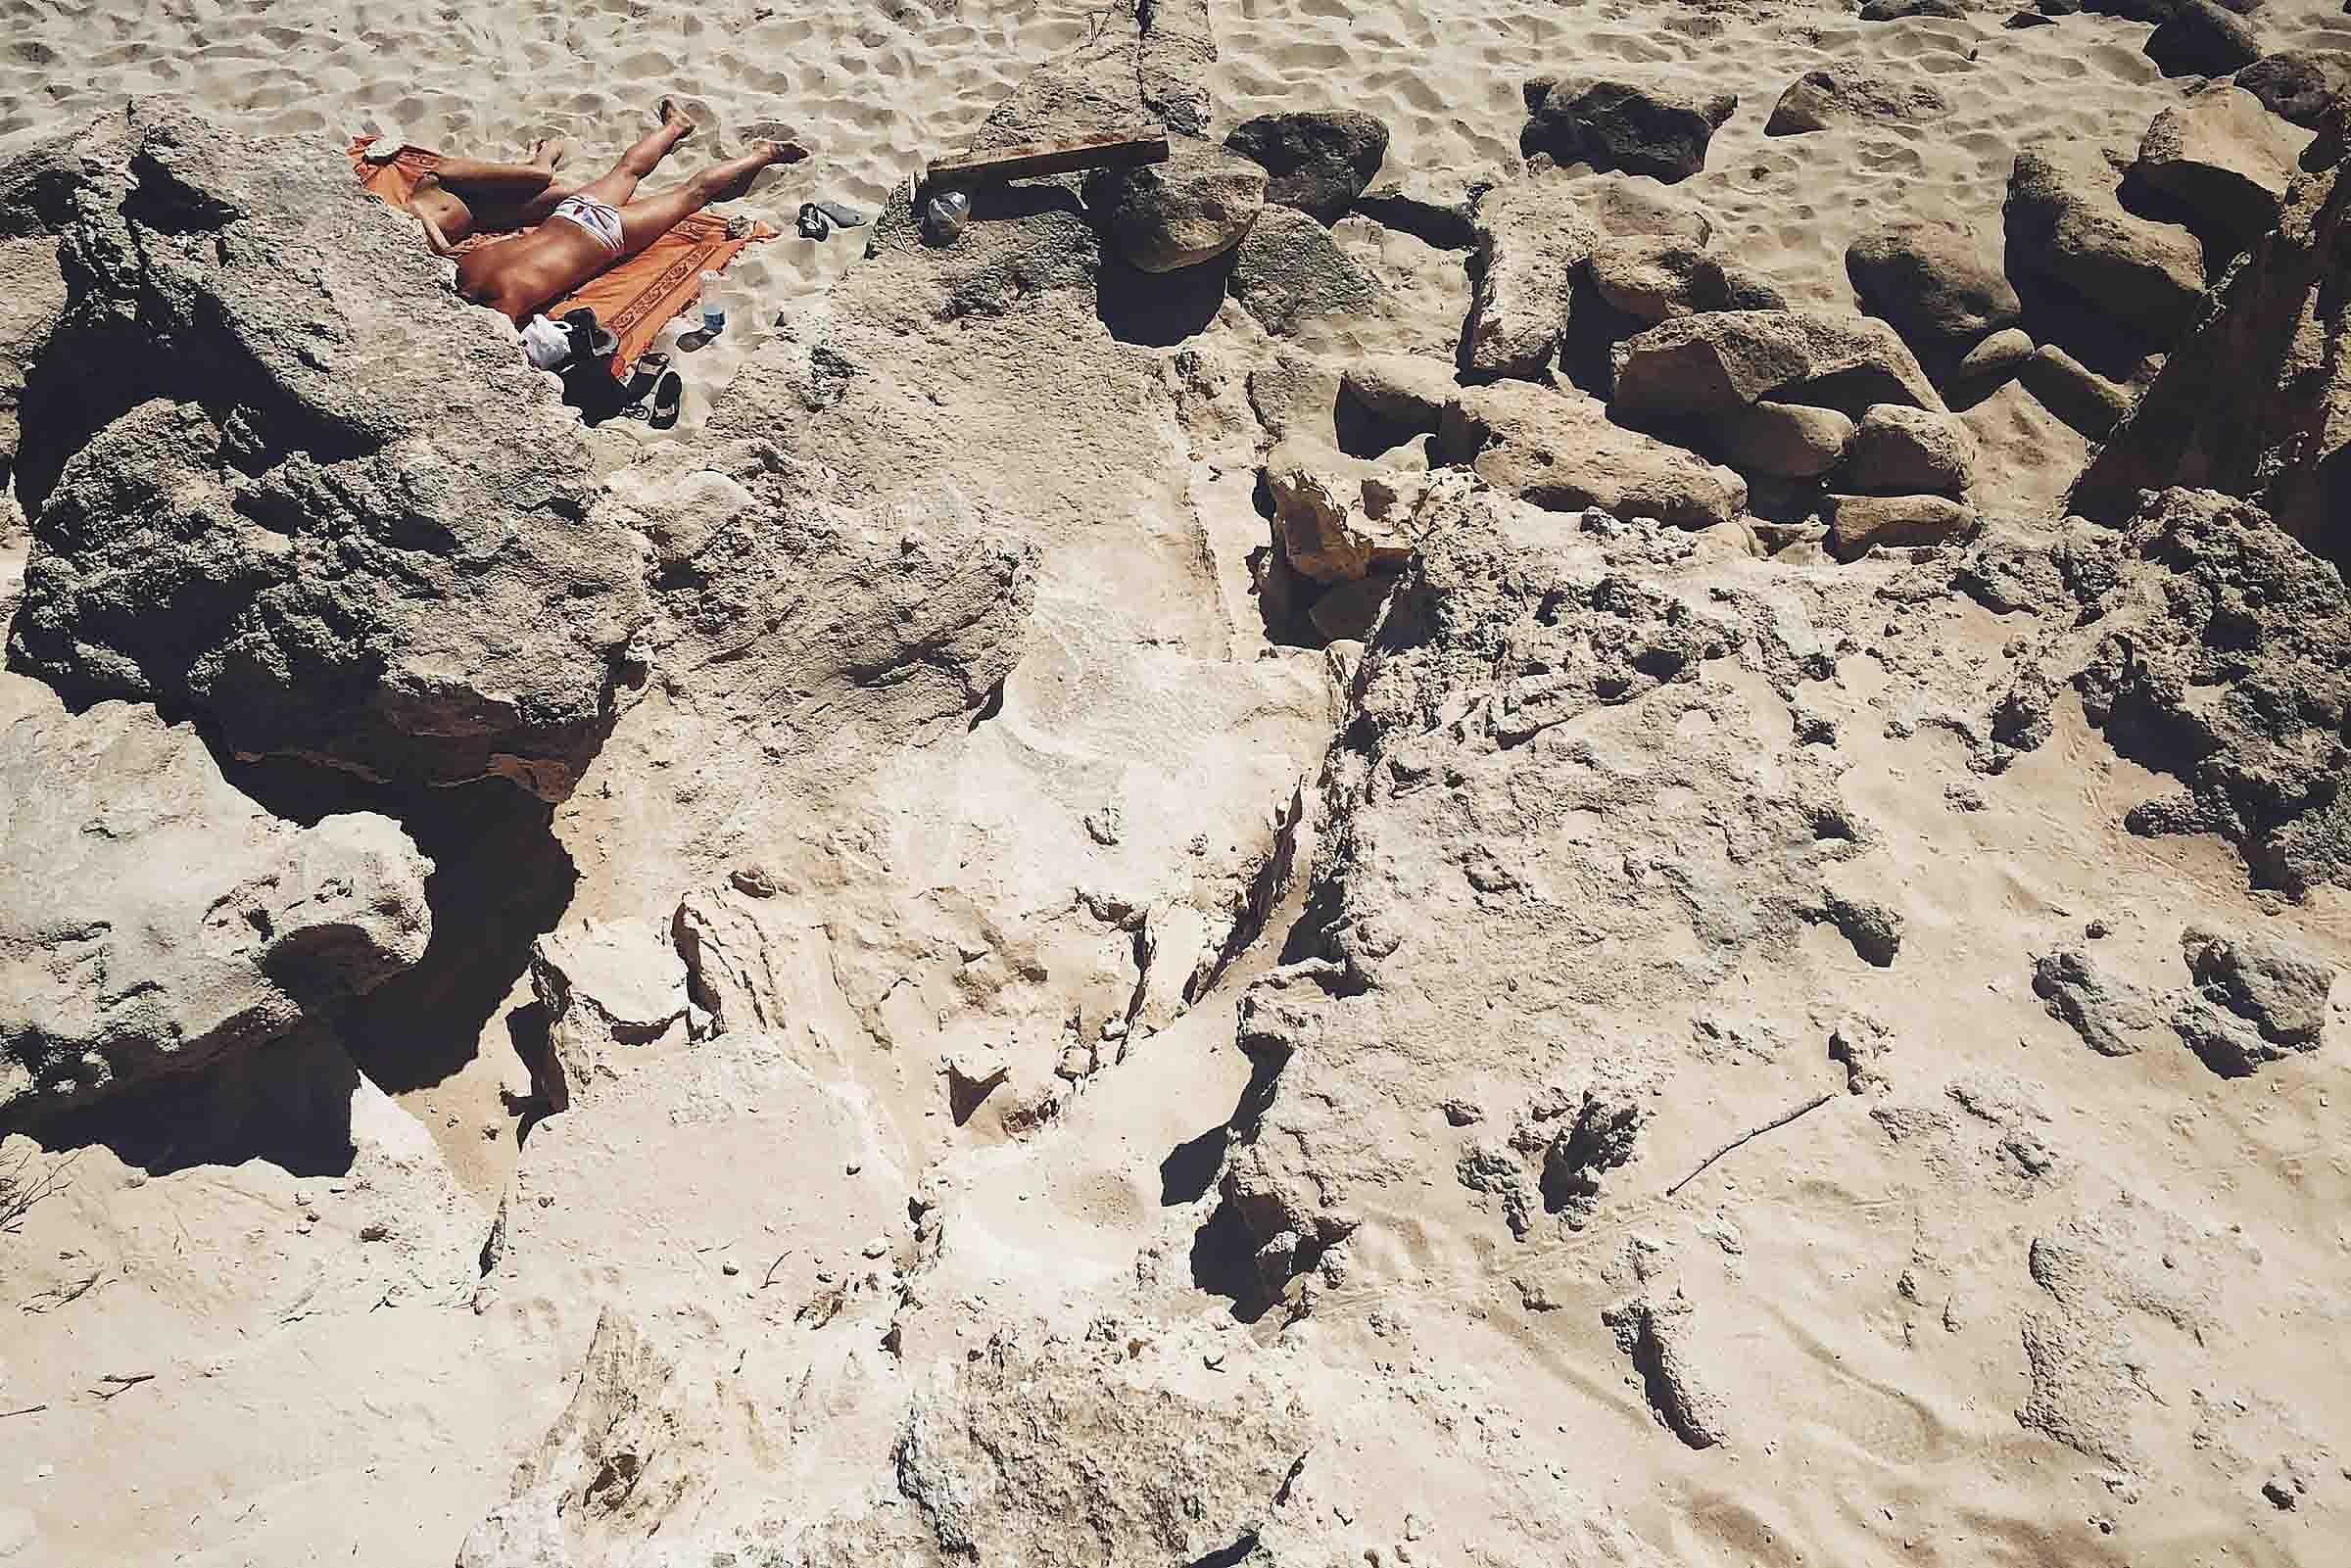 Beach bodies ibiza